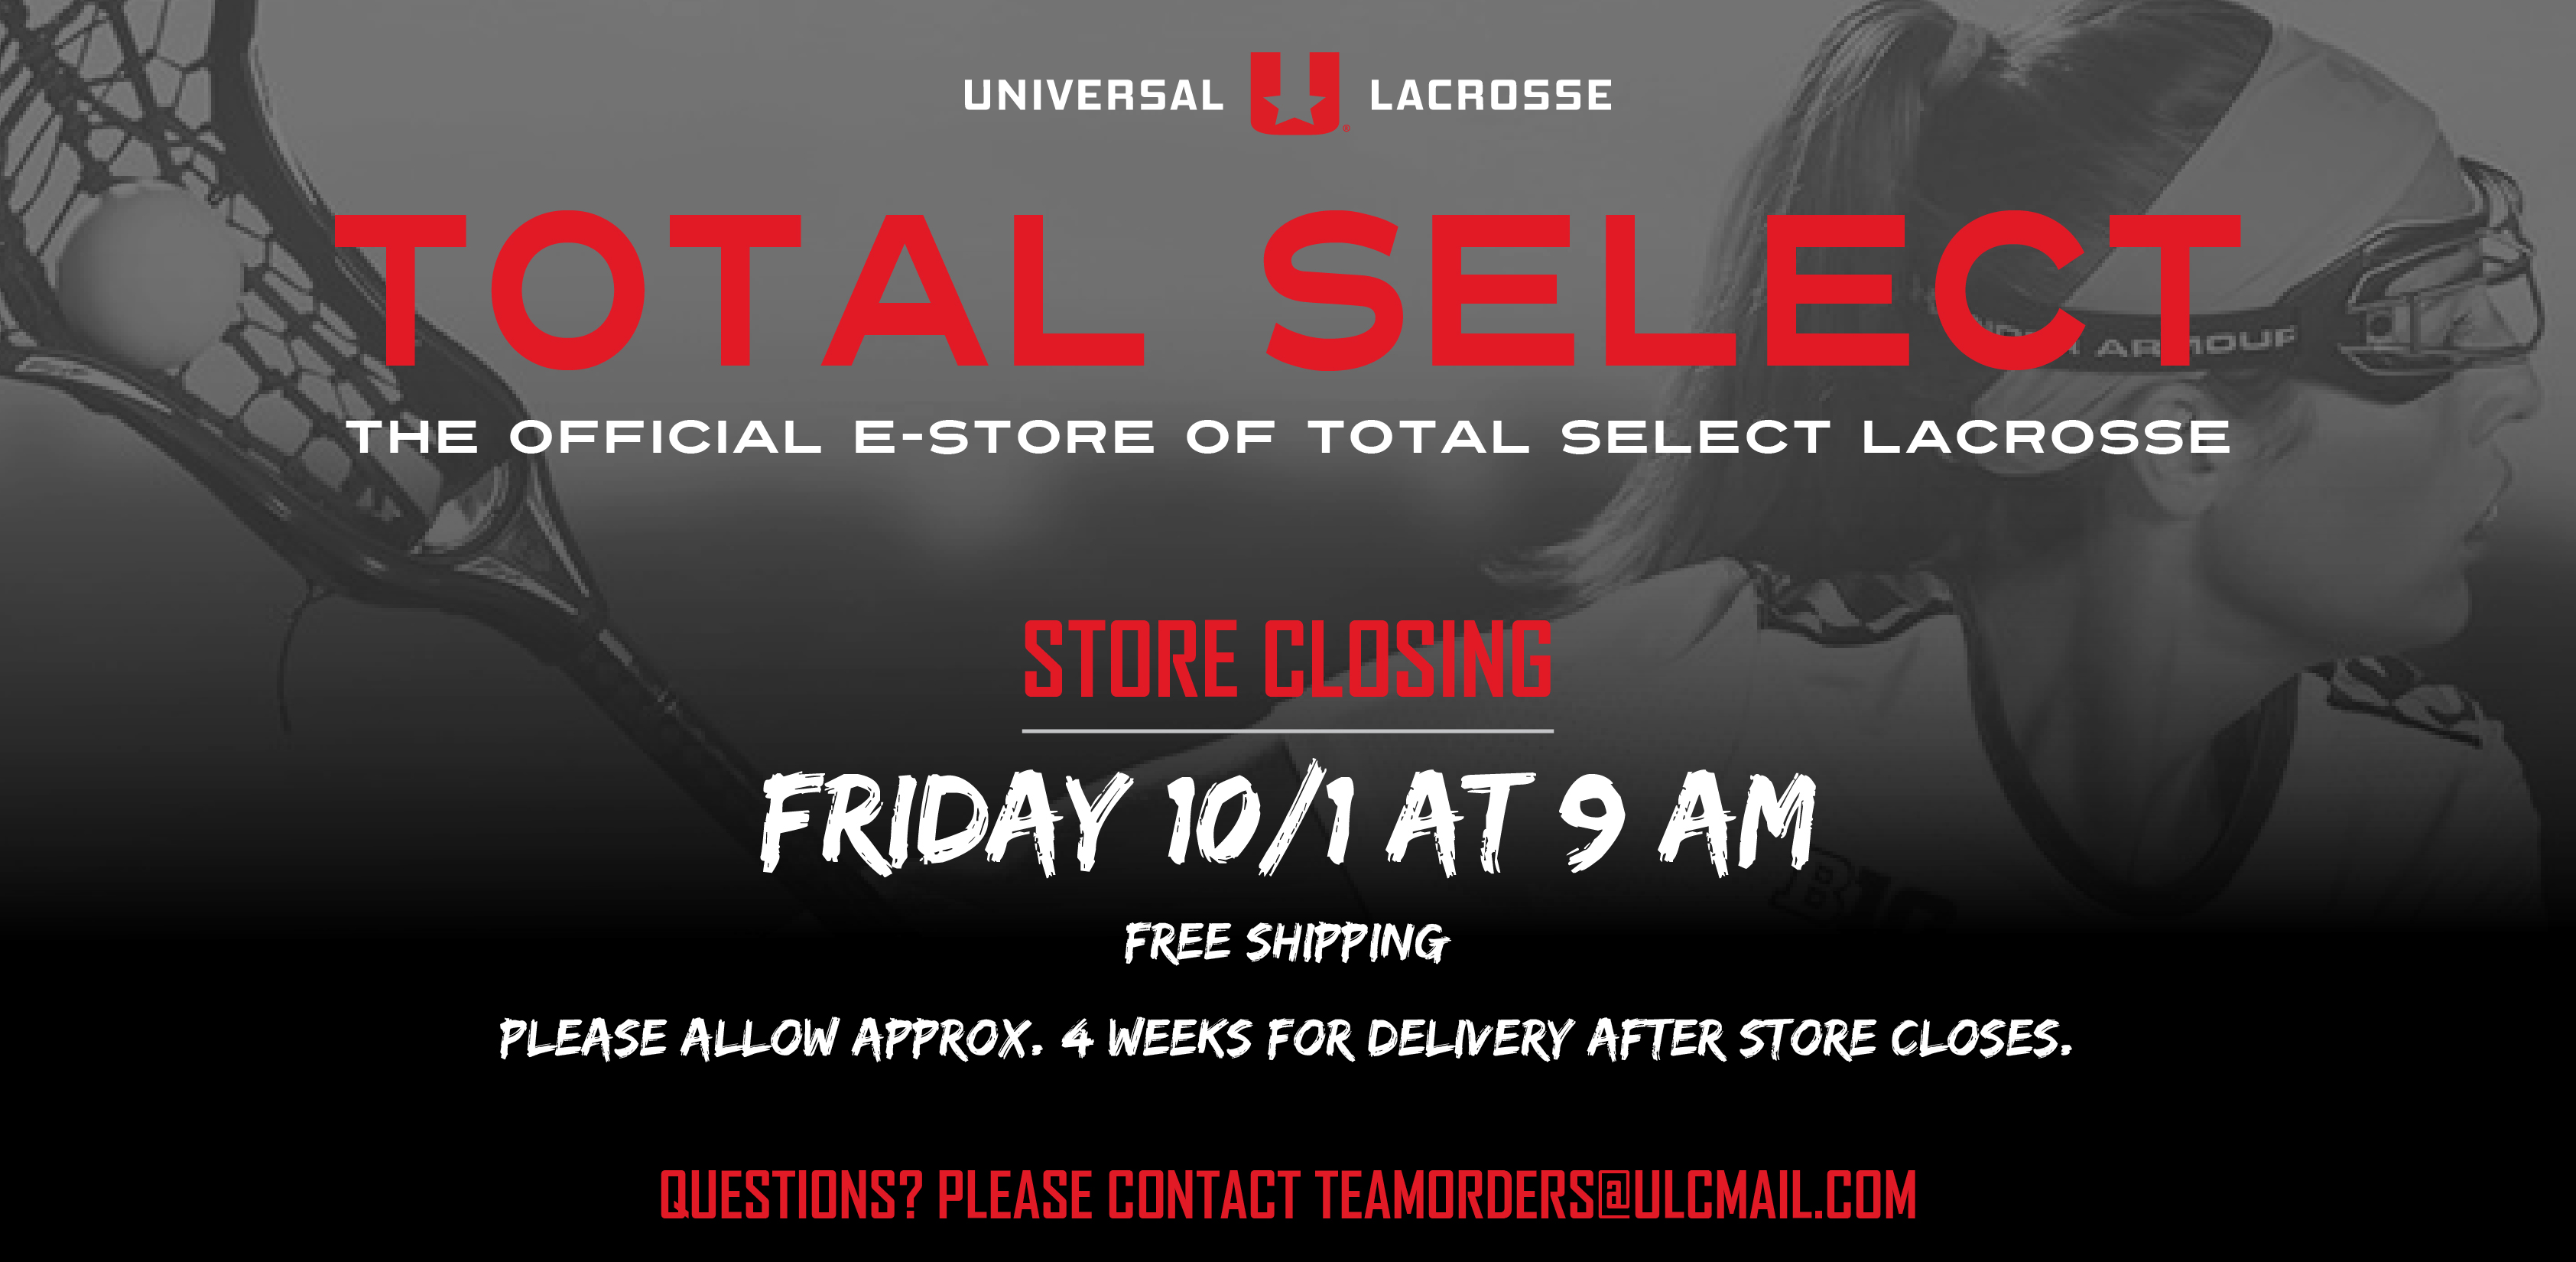 Total Select Lacrosse